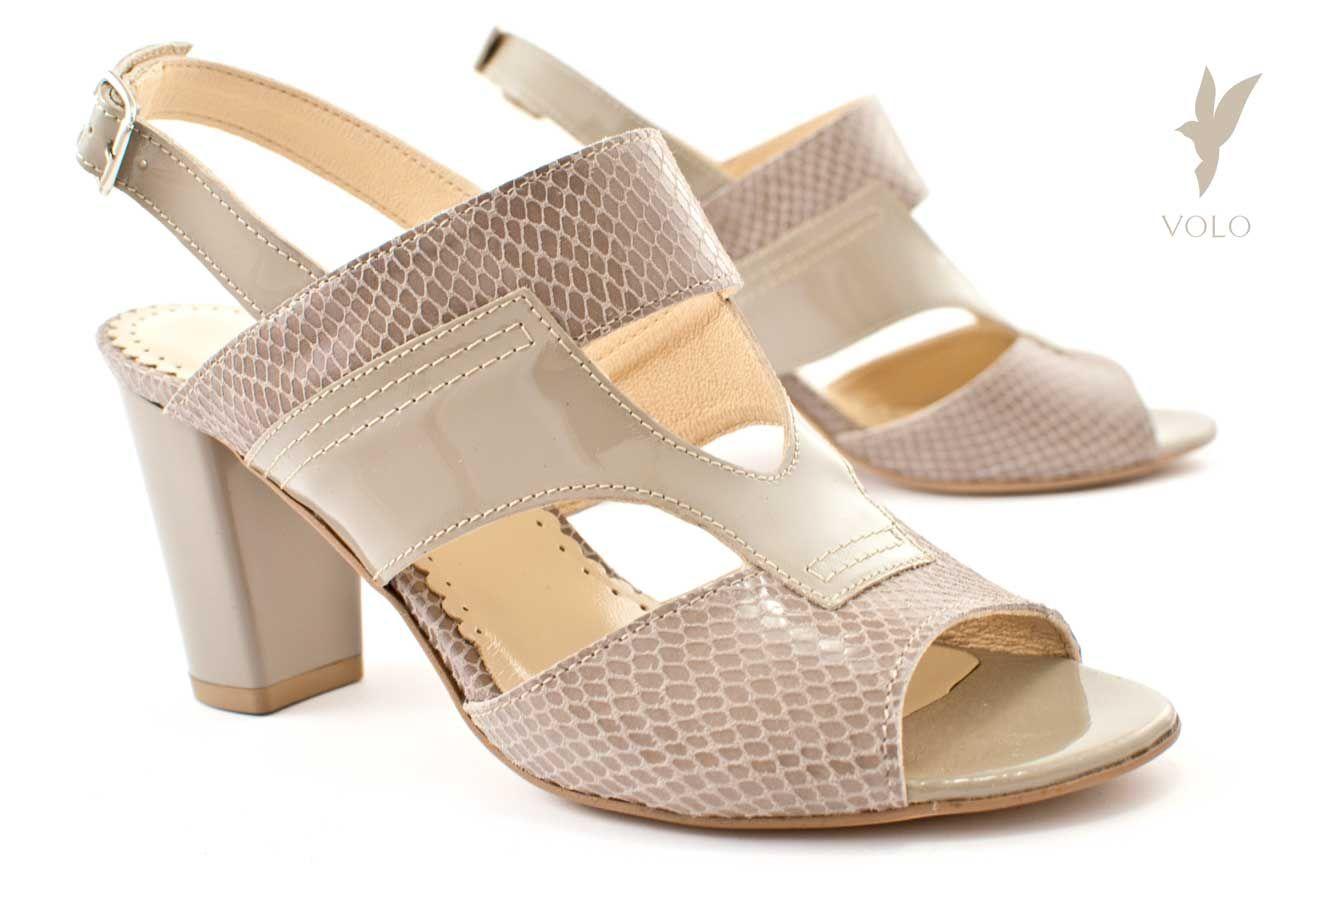 Sandaly Na Obcasie Clara Stabilne I Wygodne Buty Volo Heels Shoes Peep Toe